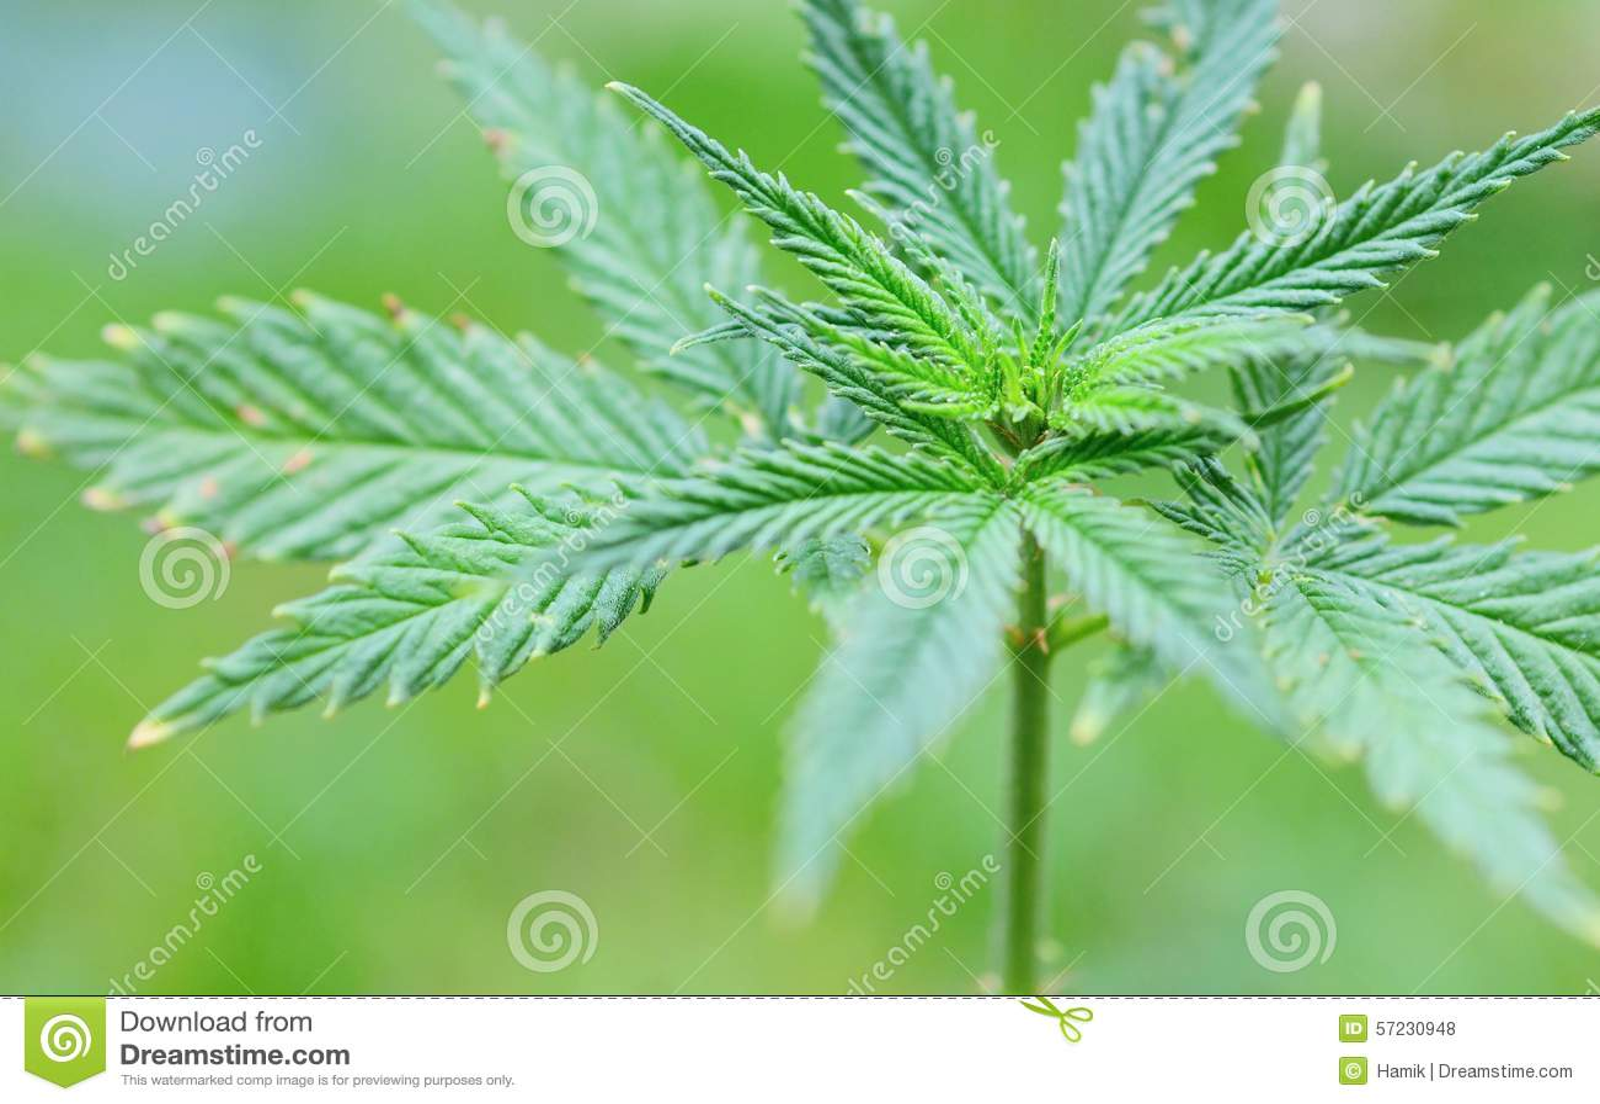 Marihuana (Cannabis) installatie